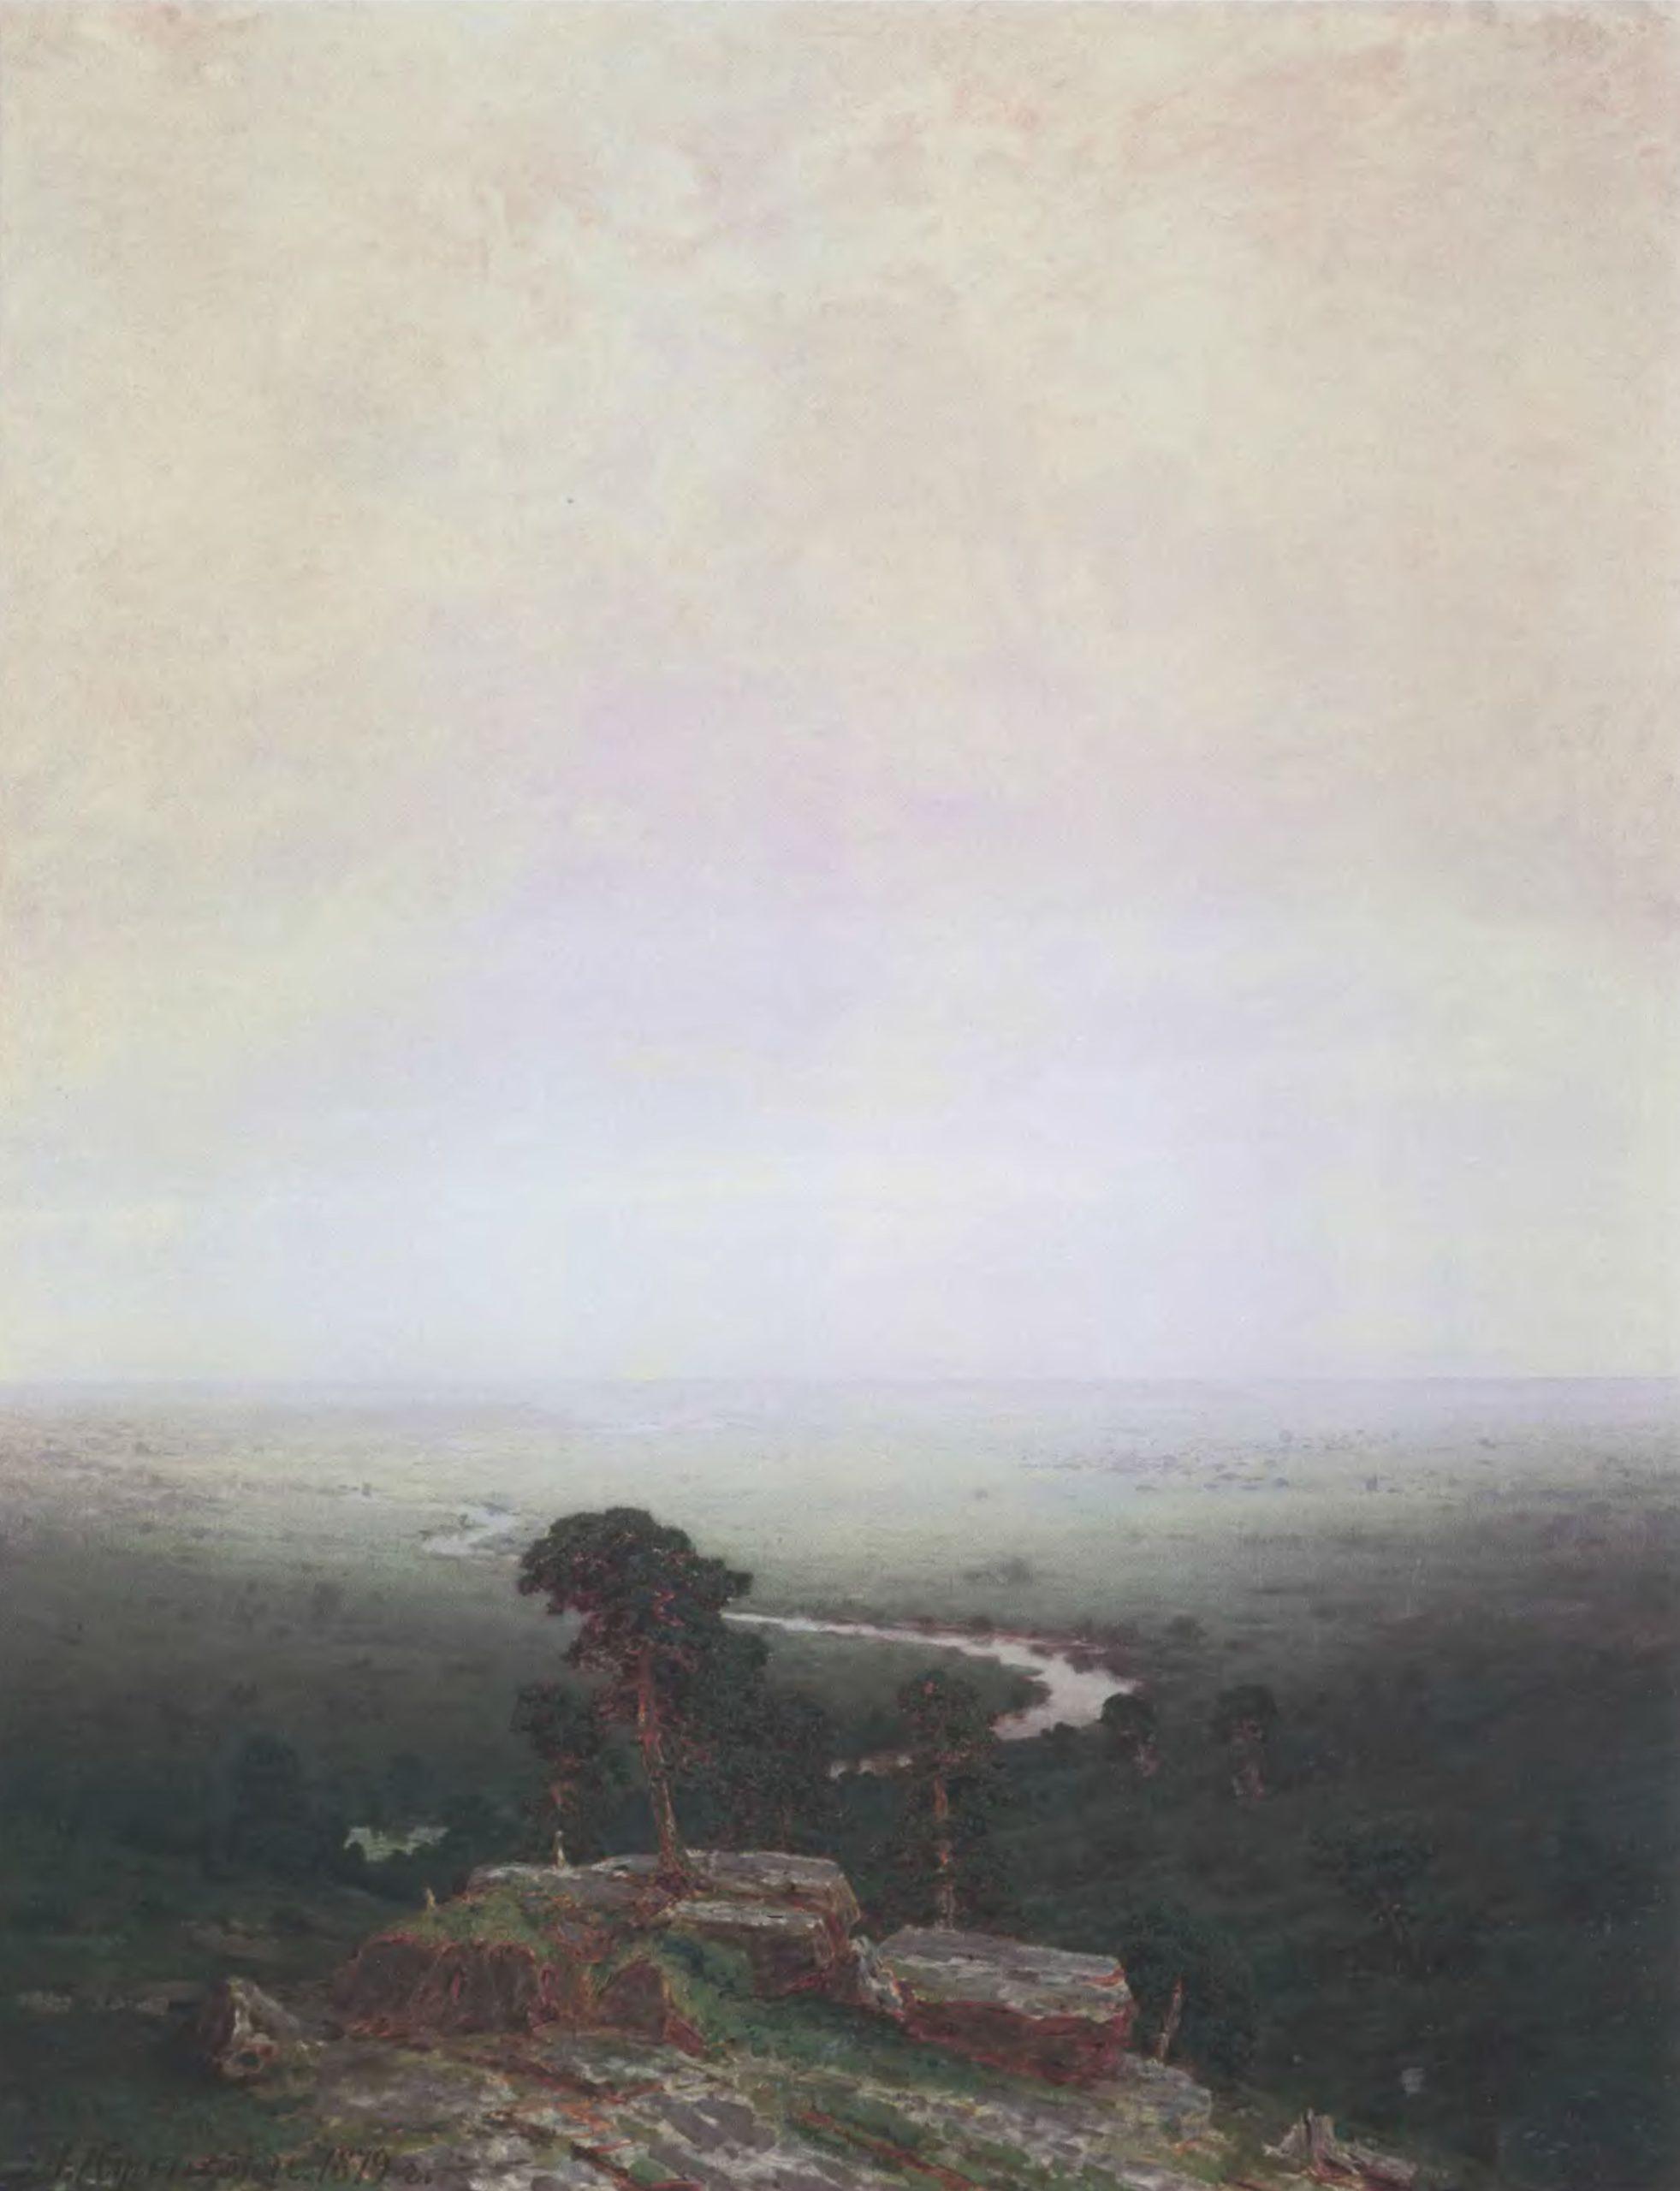 АРХИП КУИНДЖИ. Север. 1879. Холст, масло. 132 х 103 см. Государственная Третьяковская галерея